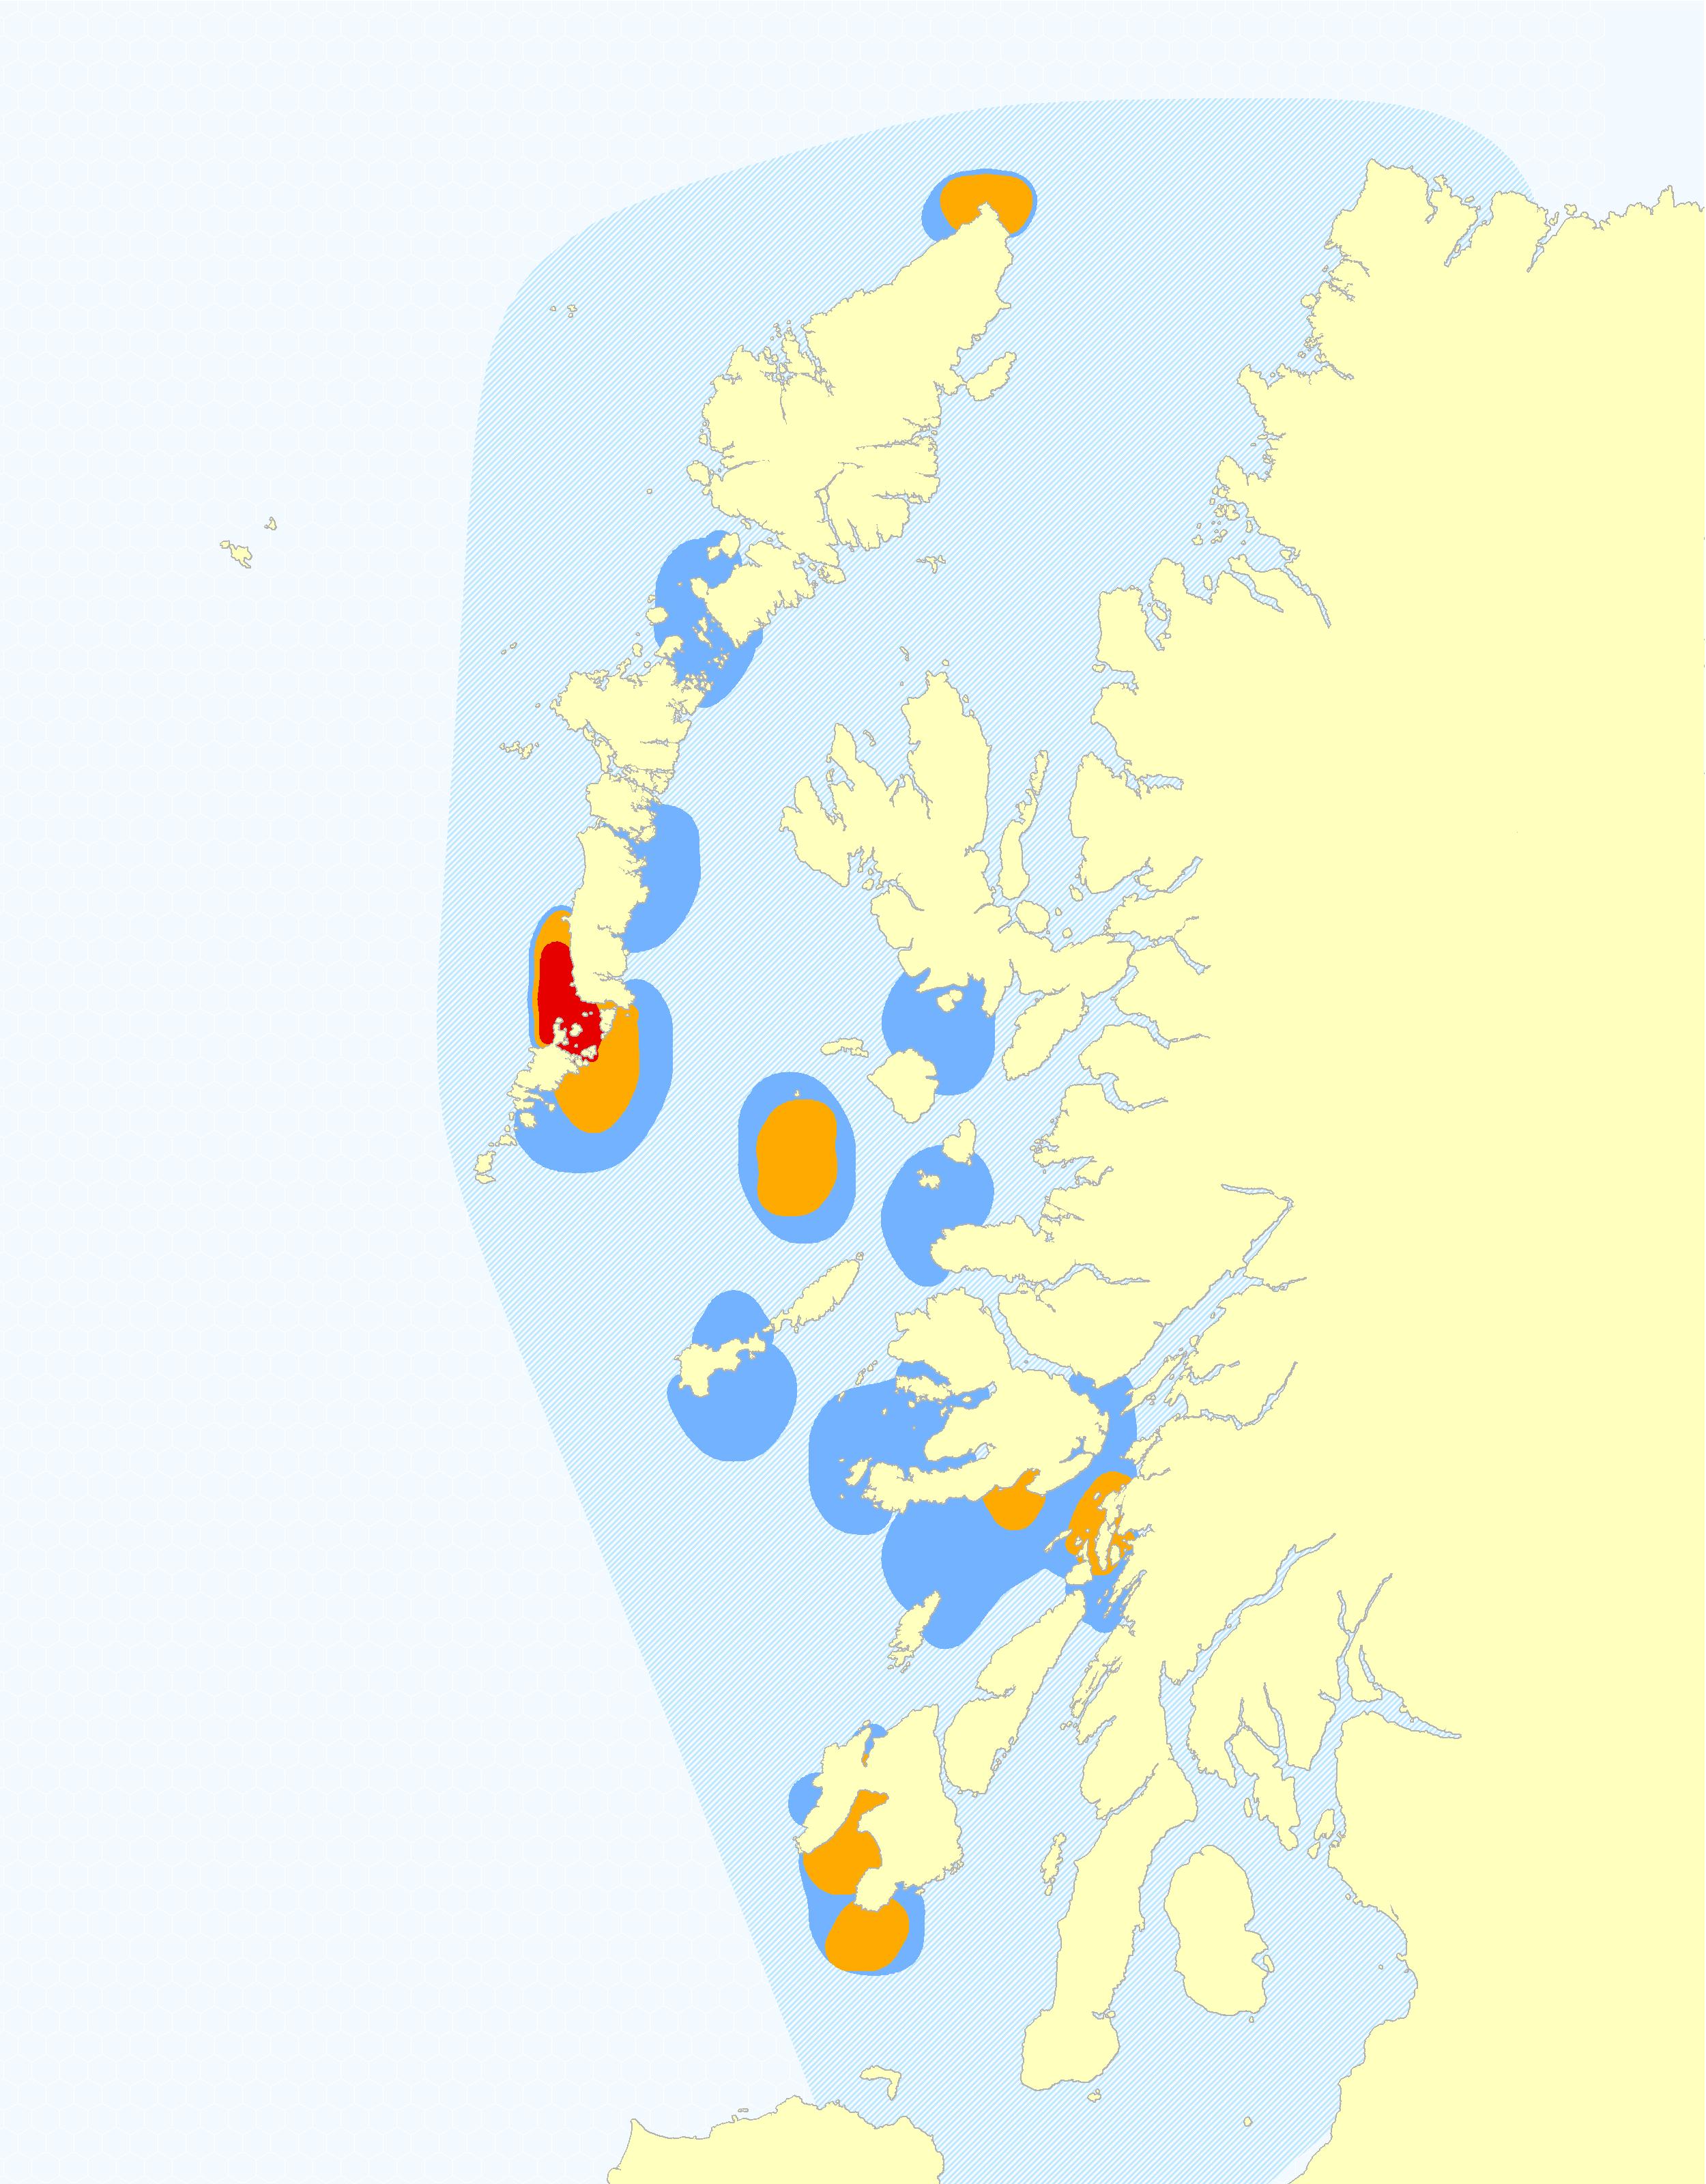 Bottlenose Dolphin Hotspot Map